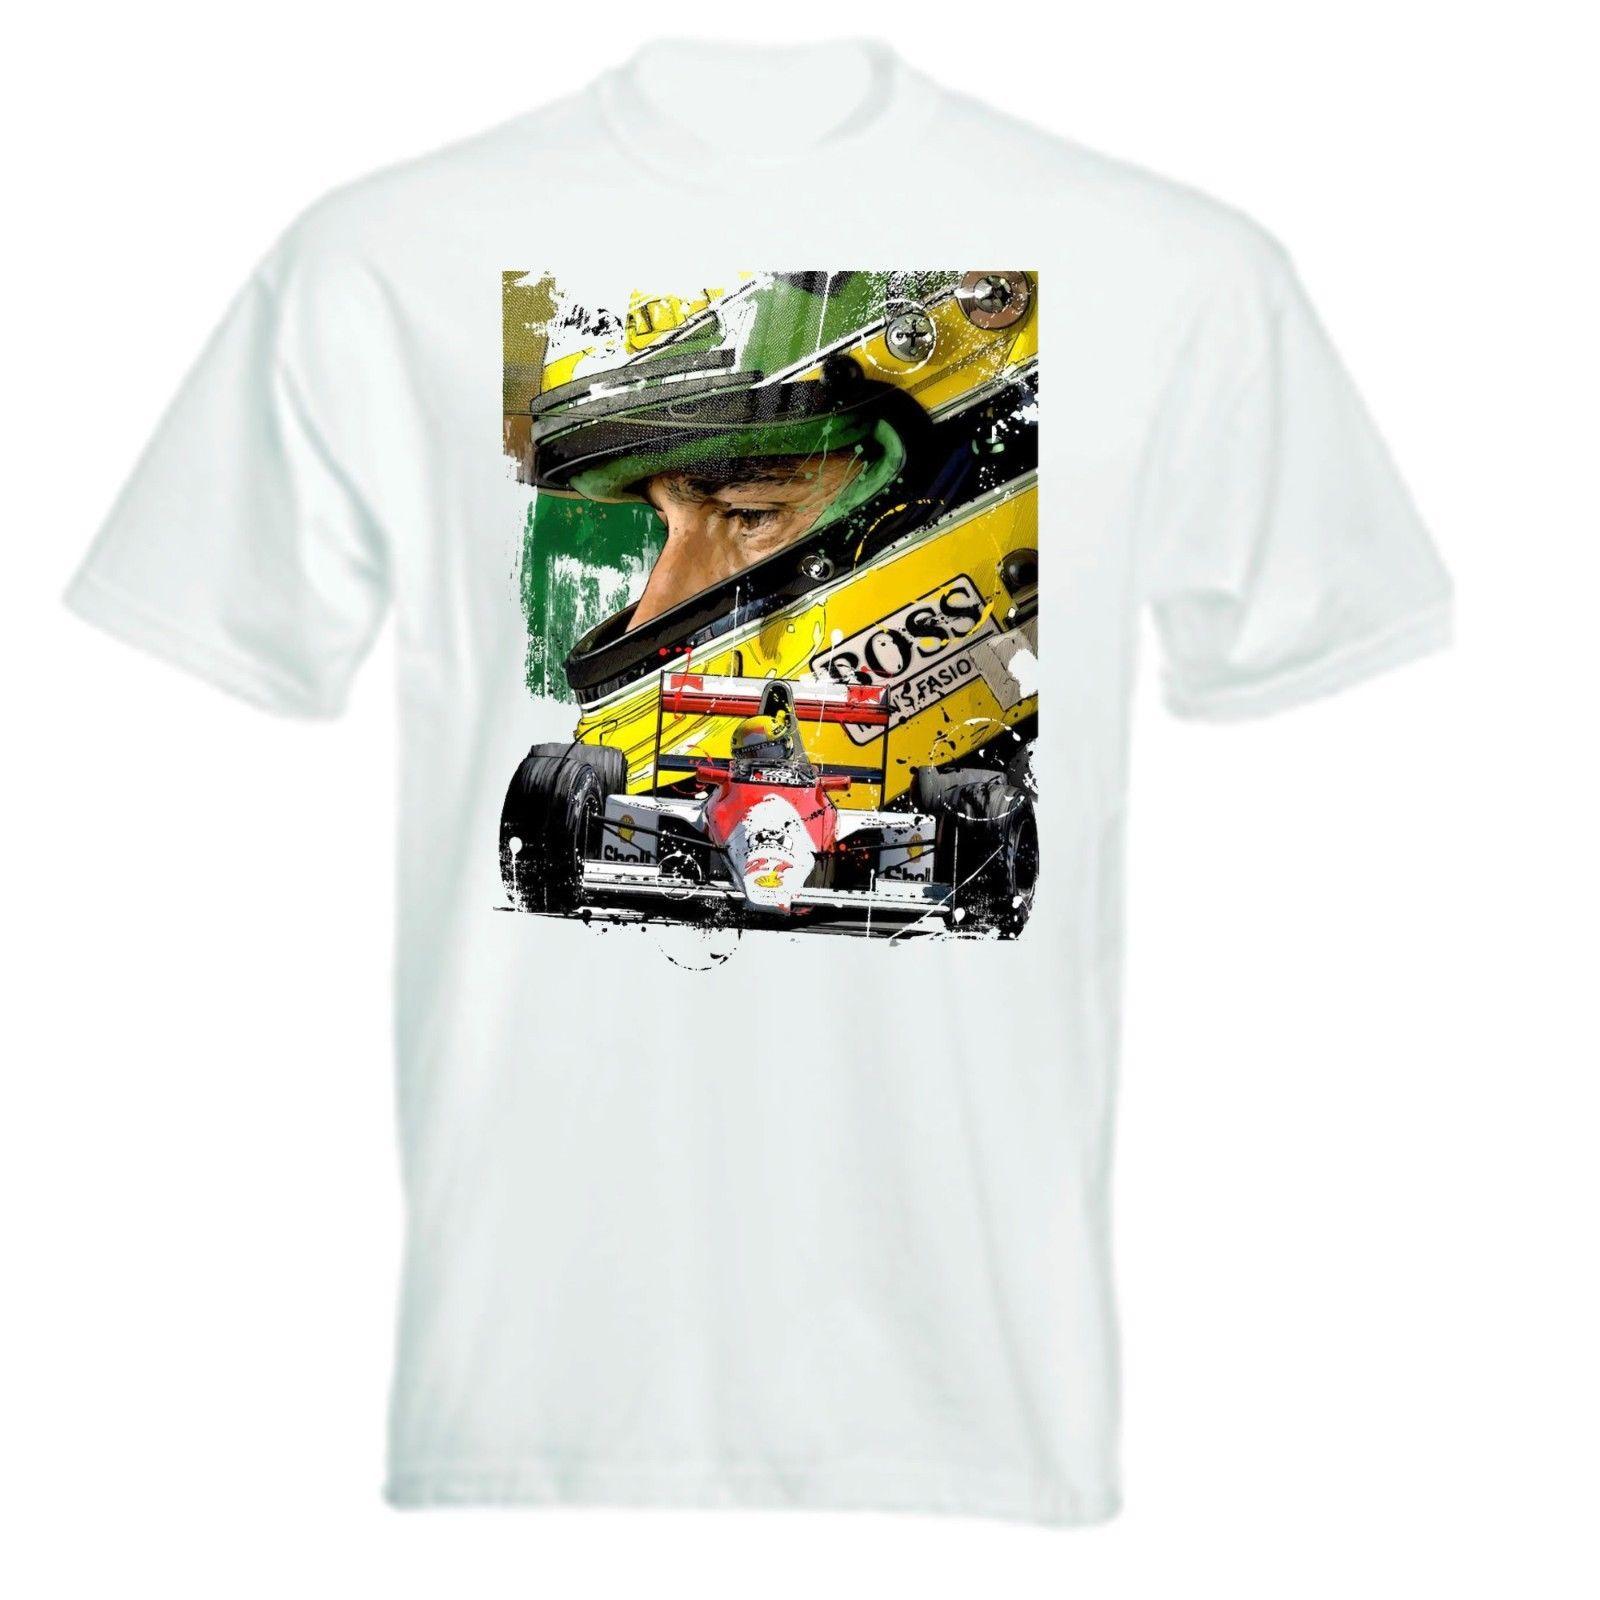 ayrton-font-b-senna-b-font-artwork-t-shirt-sleeves-boy-cotton-men-t-shirt-top-tee-funny-tops-tee-casual-o-neck